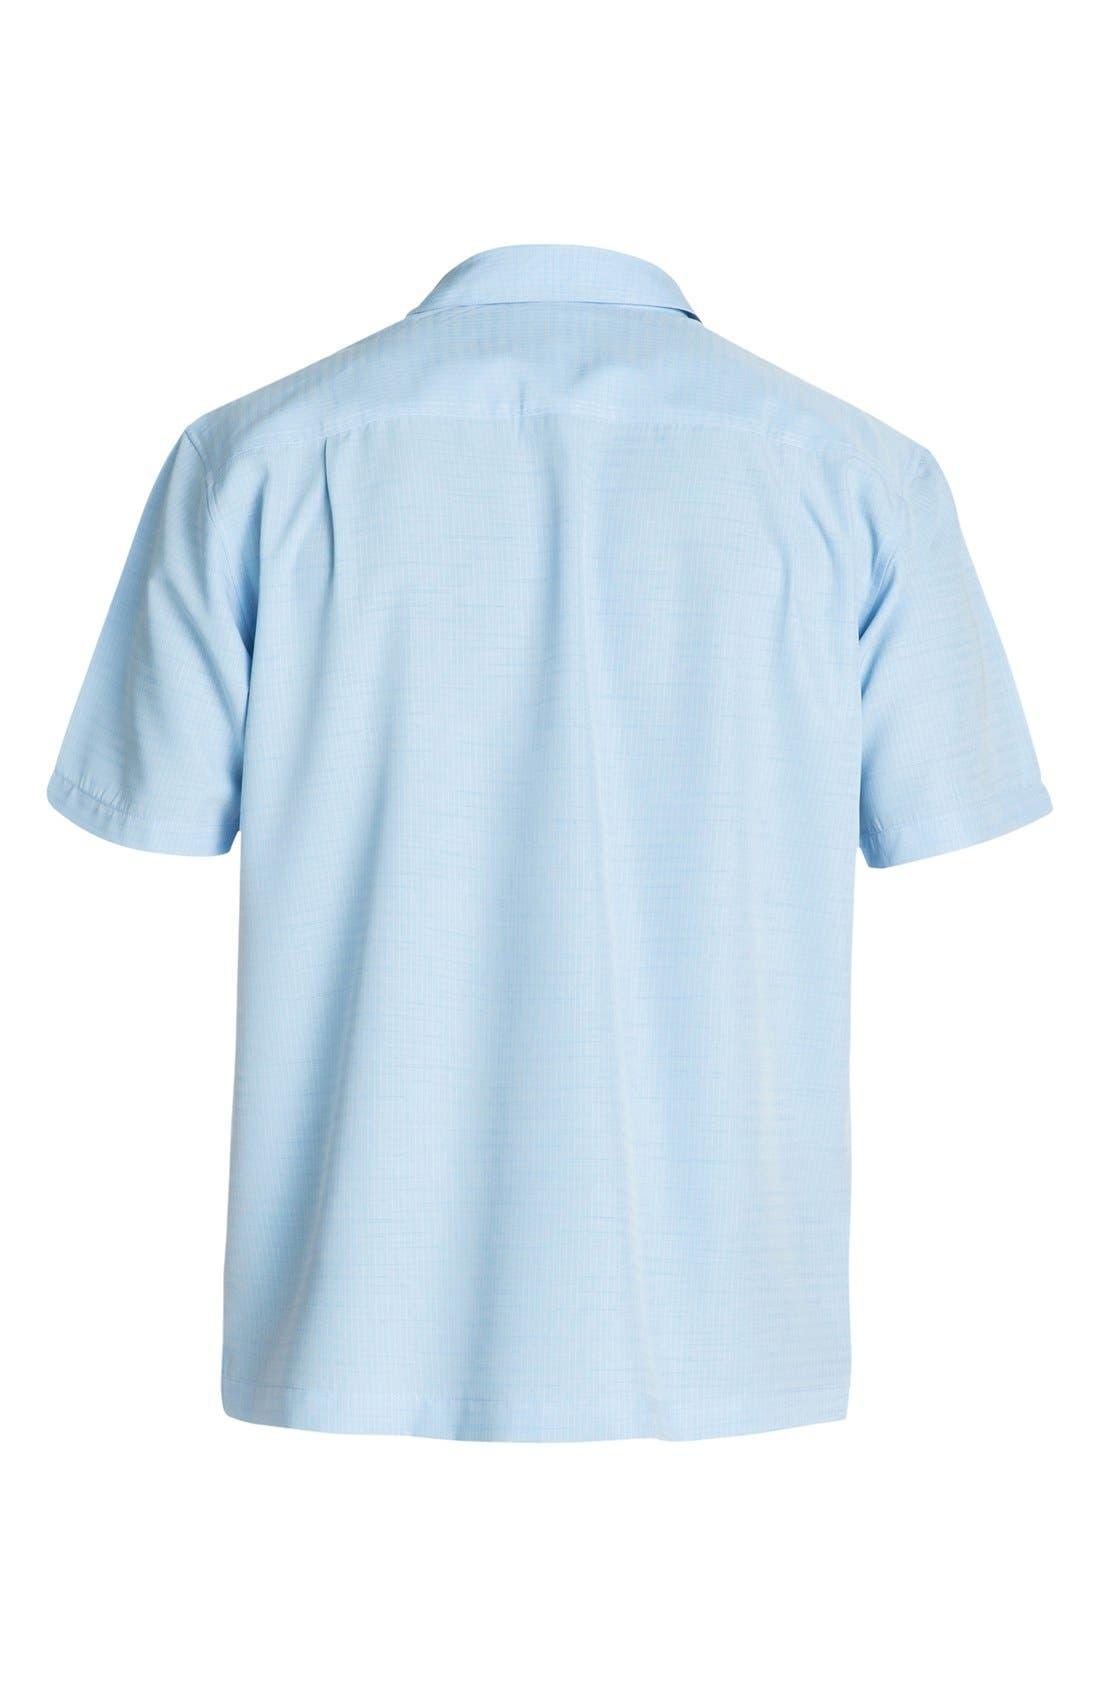 'Centinela 4' Short Sleeve Sport Shirt,                             Alternate thumbnail 34, color,